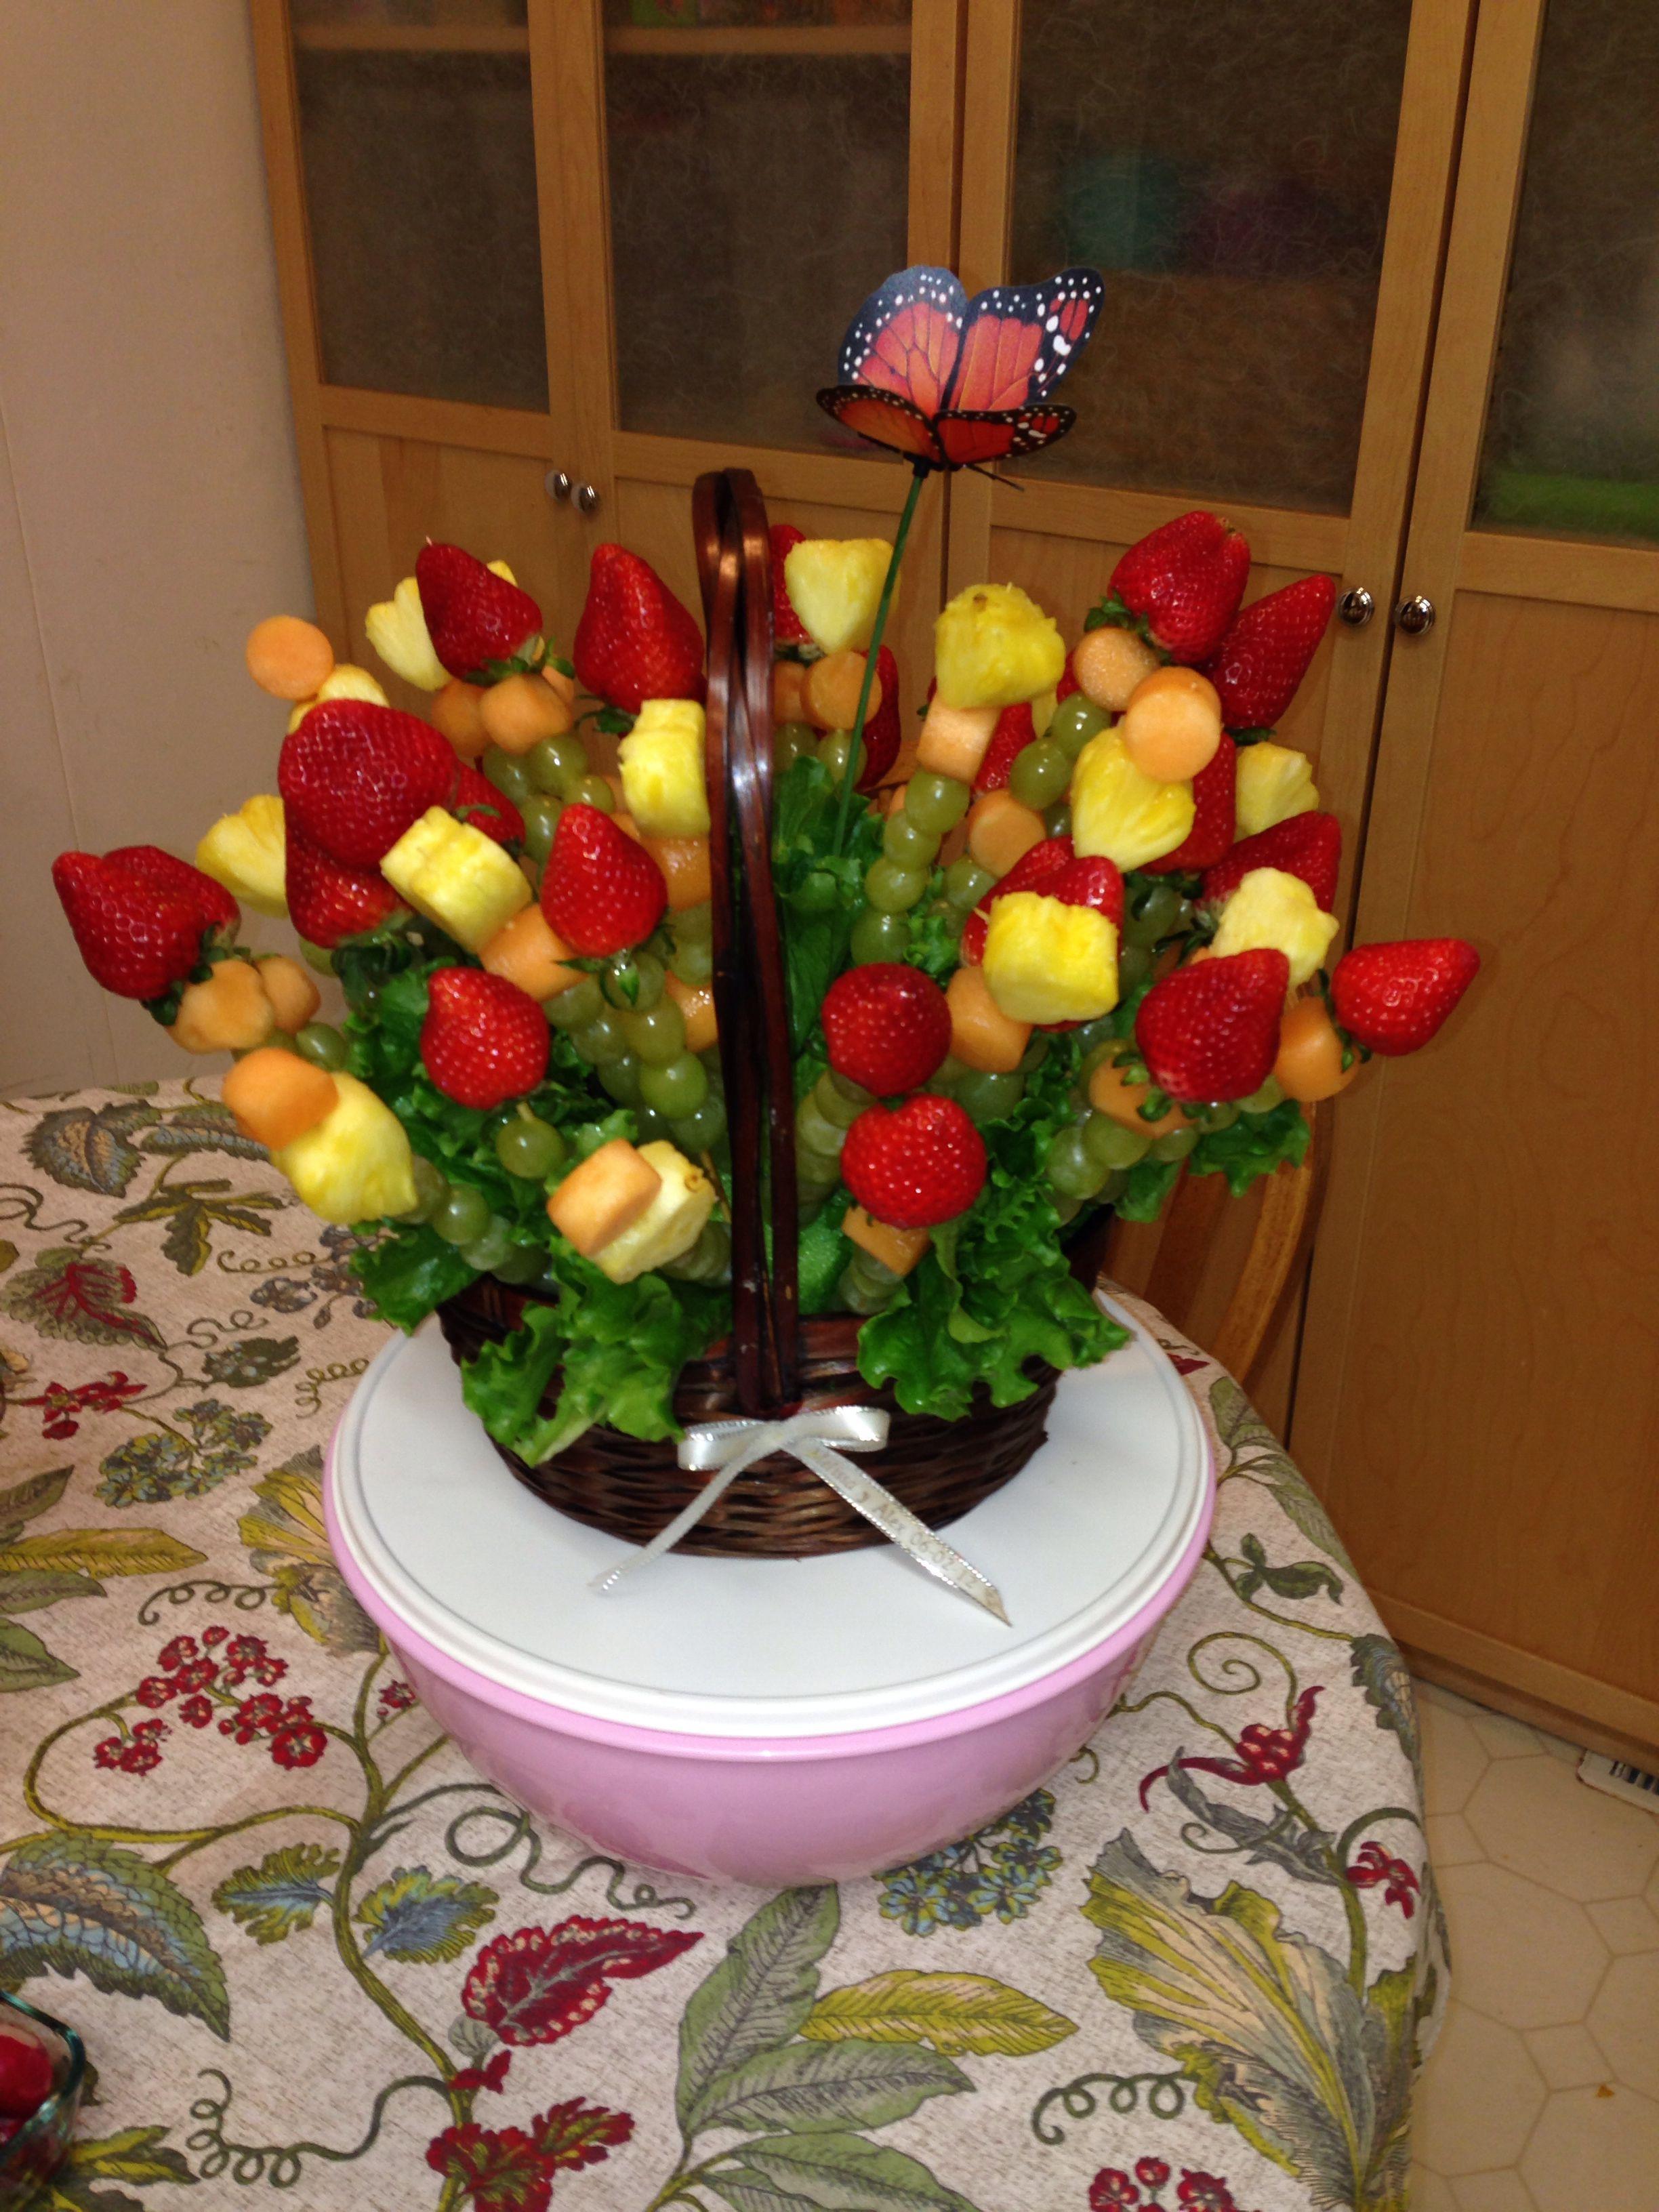 Mi primer arreglo frutal   Mis creaciones ;)   Pinterest   Fruit ...